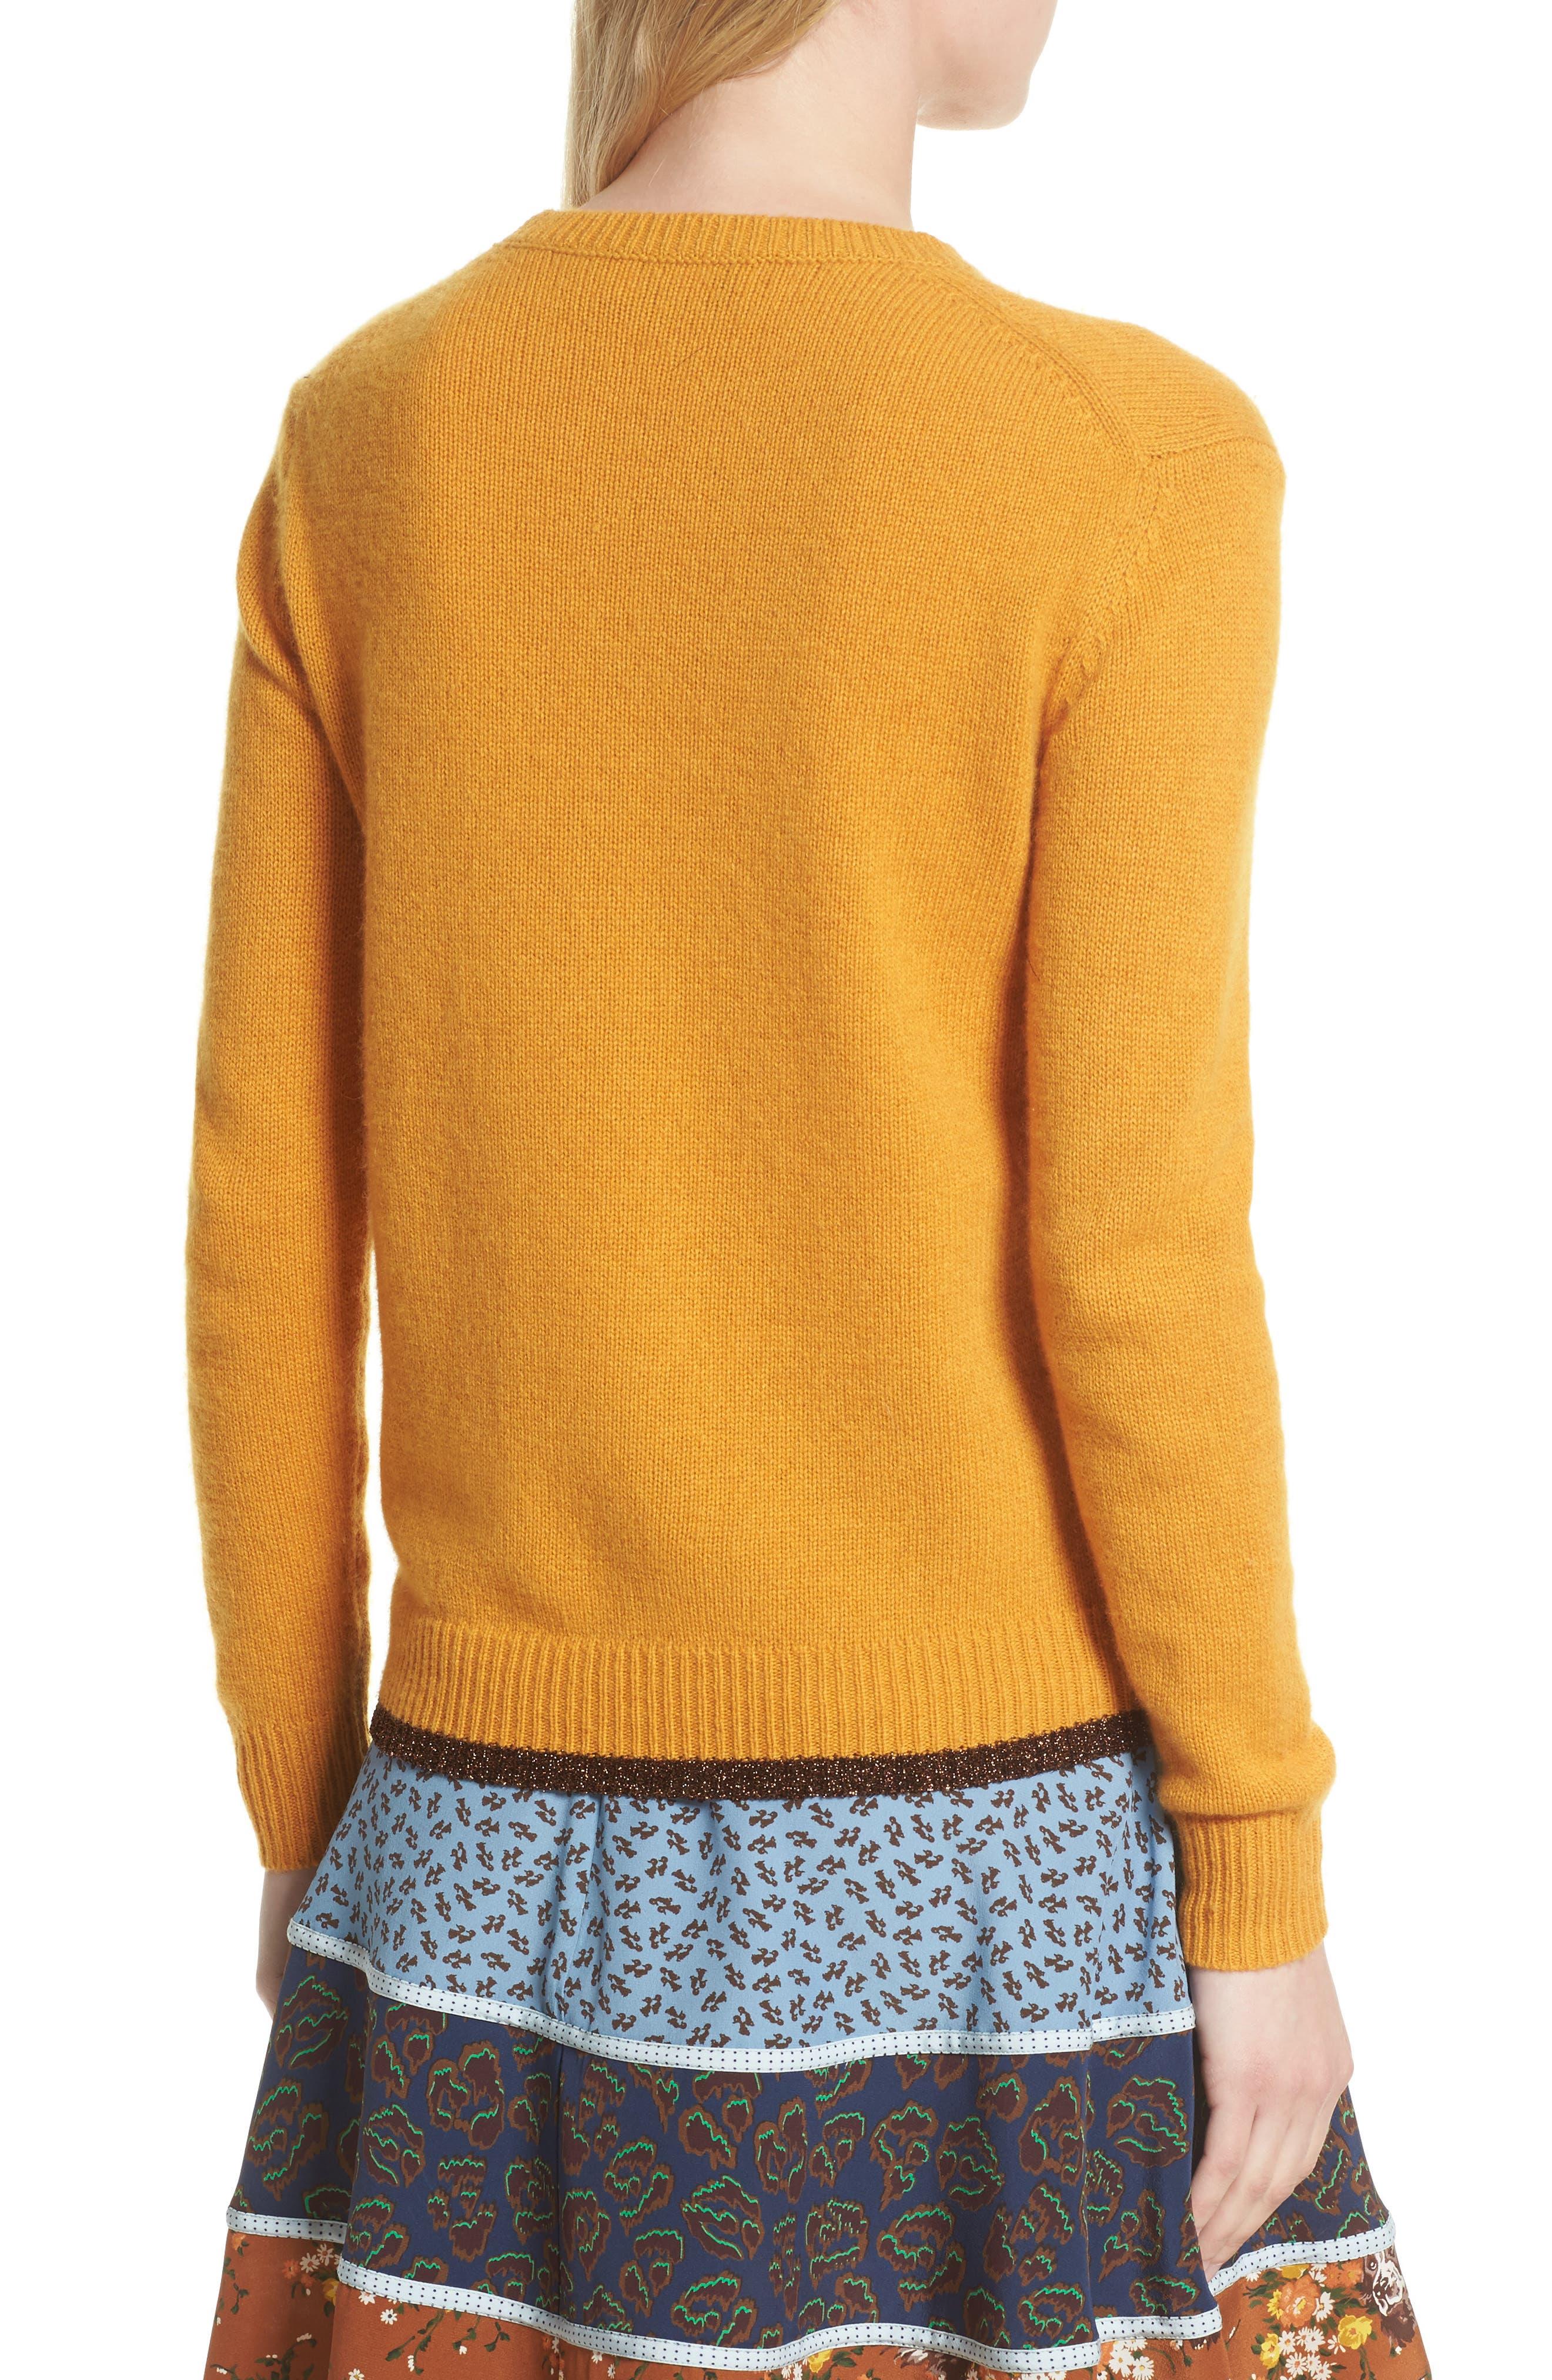 Intarsia Dog Cashmere Sweater,                             Alternate thumbnail 2, color,                             701